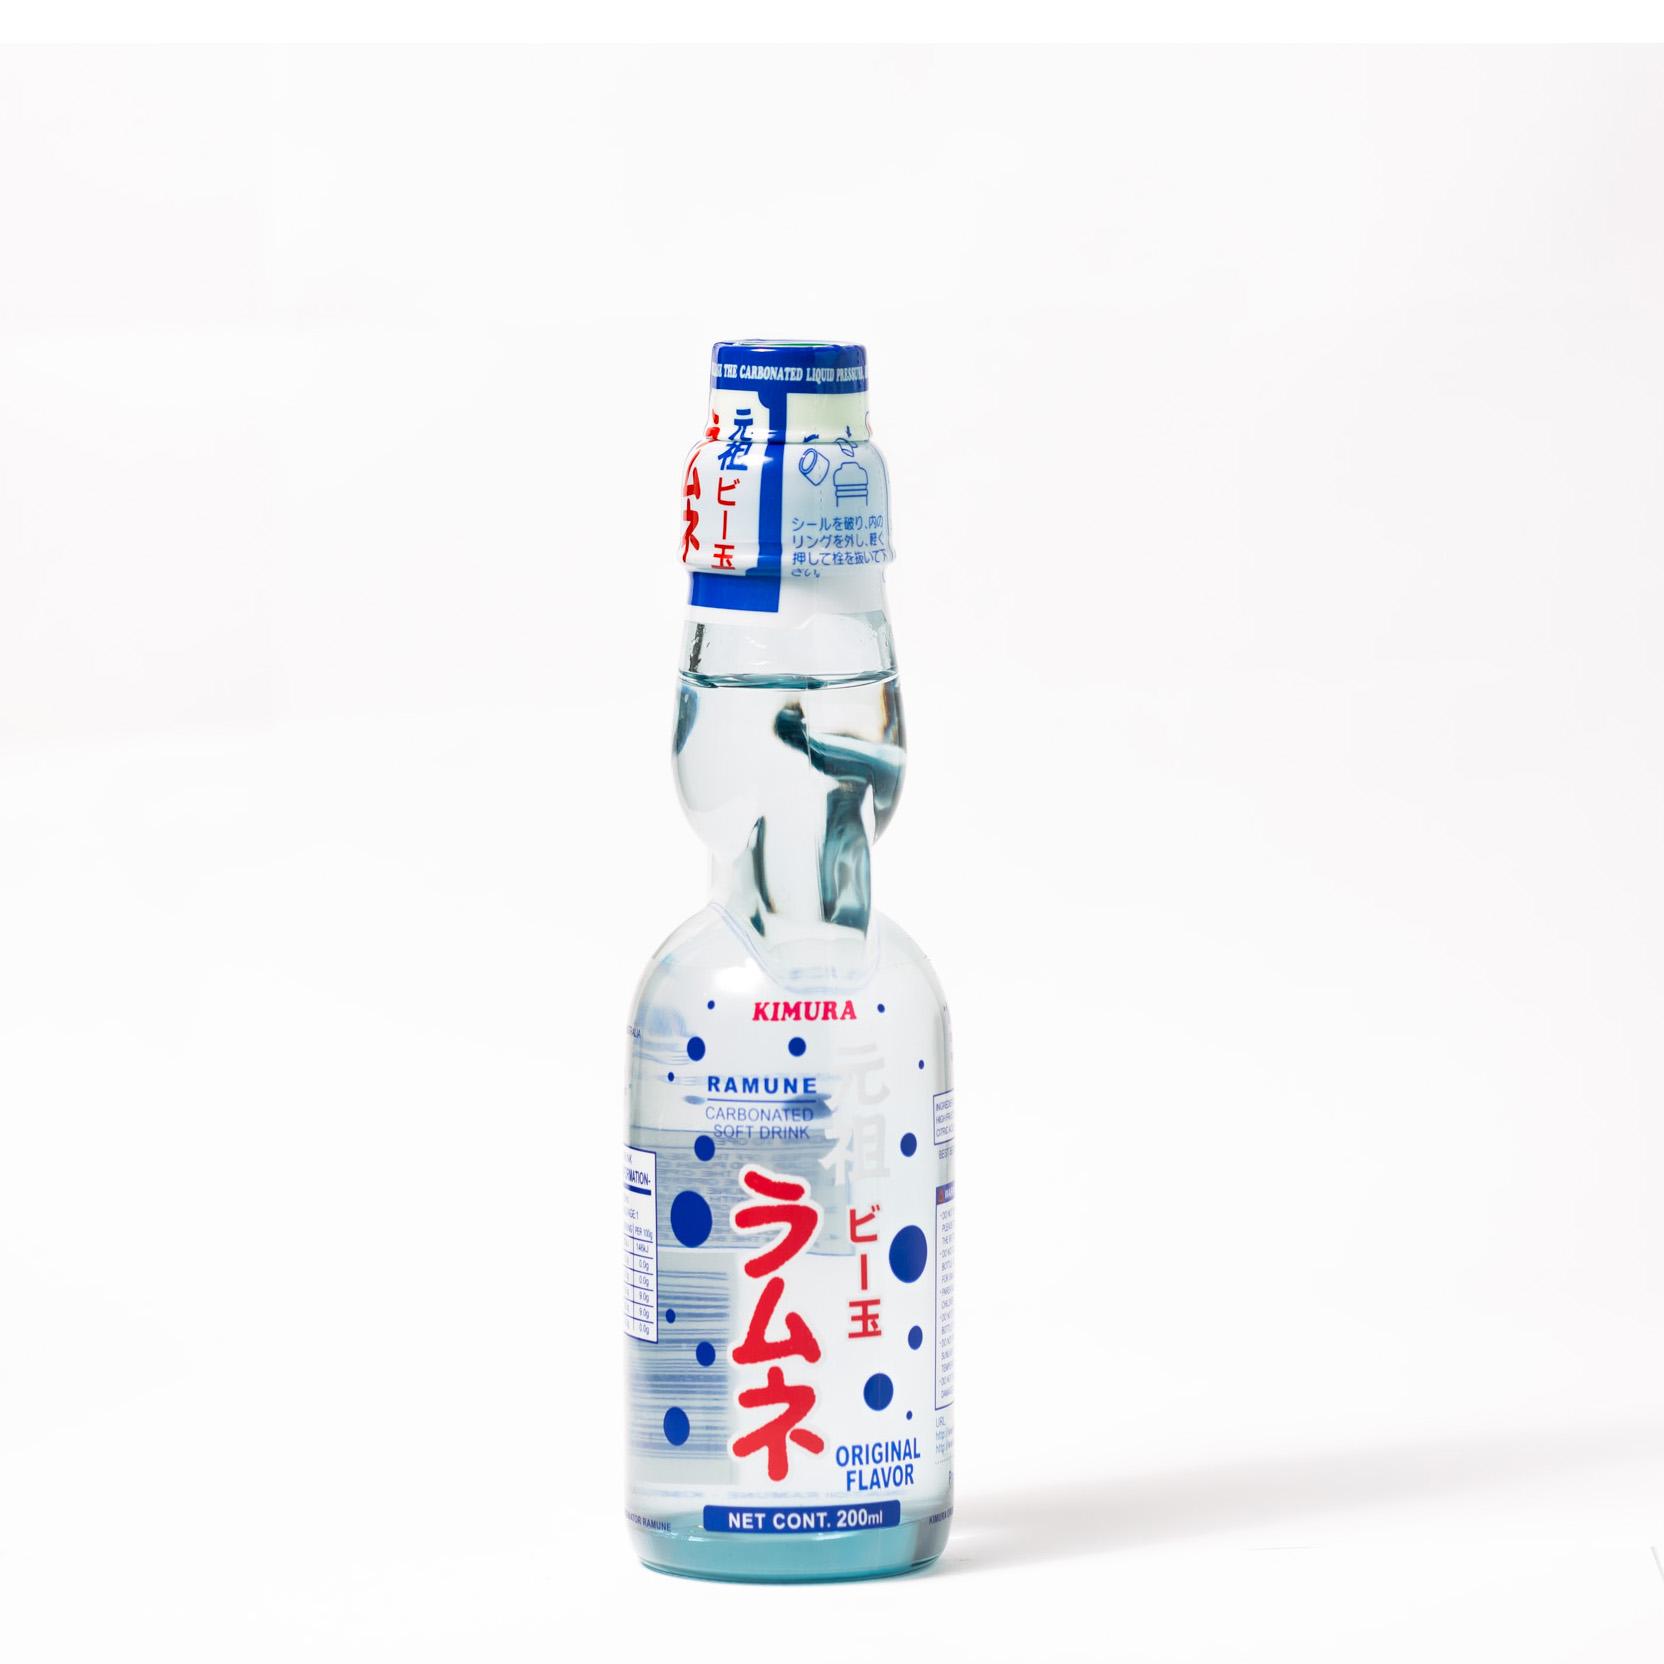 Ramune Japanese Lemonade